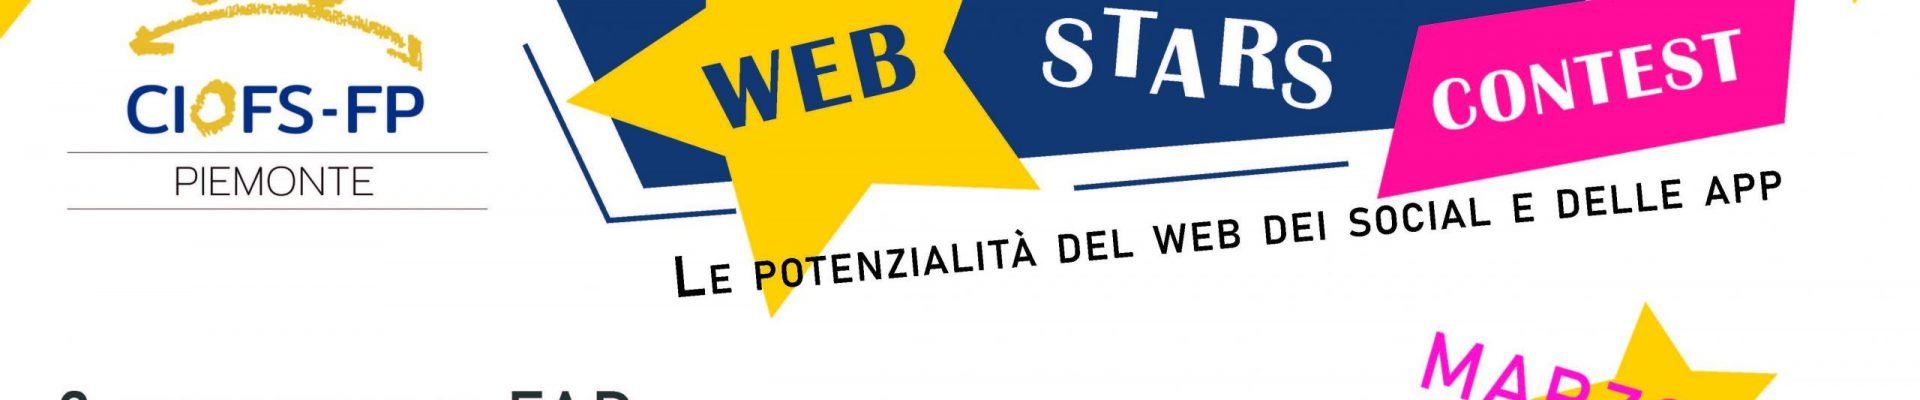 CONCORSO WEBSTARS PER IL CIOFS-FP PIEMONTE